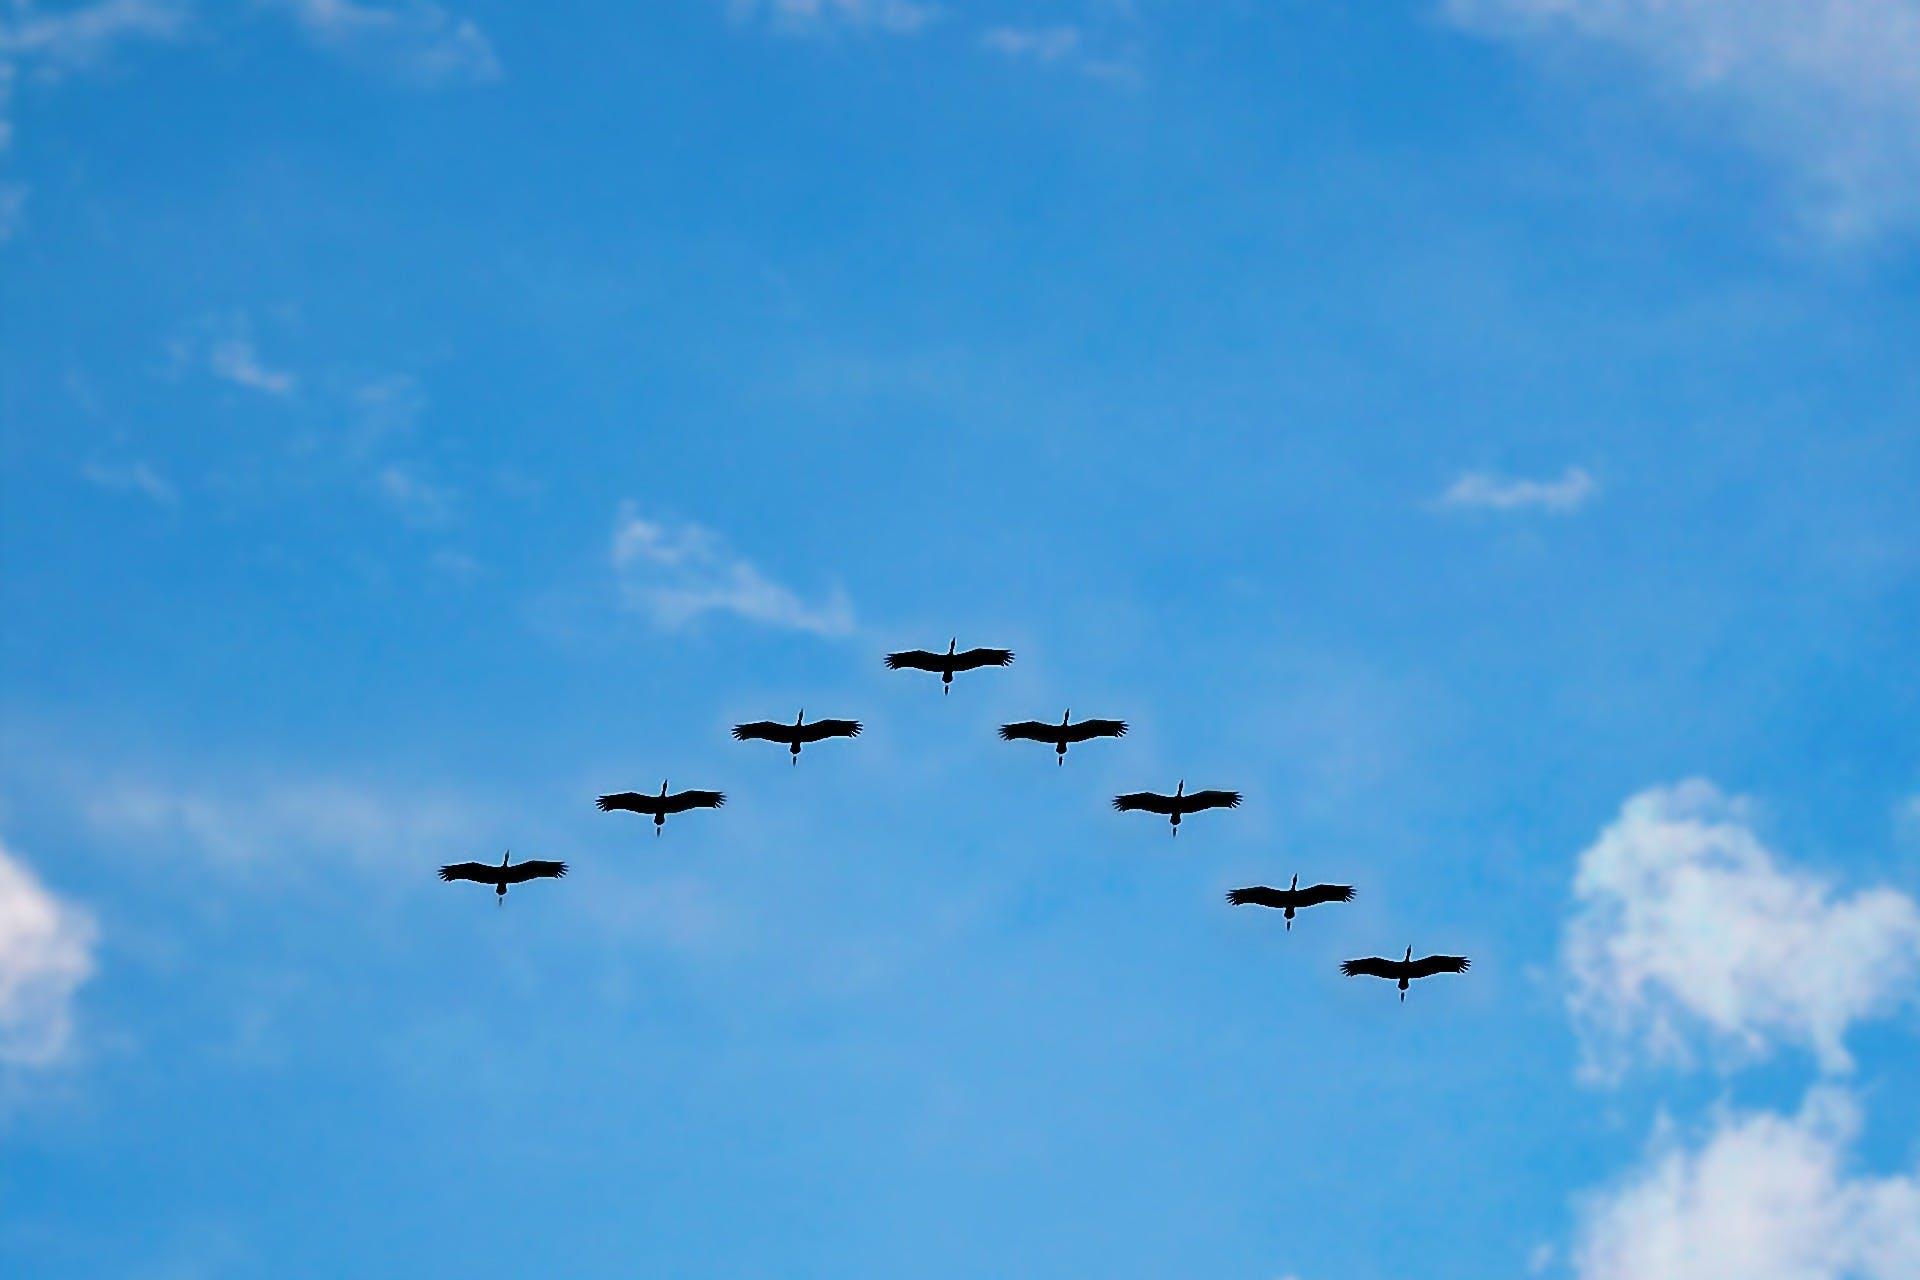 V Formation of Bird during Daytime